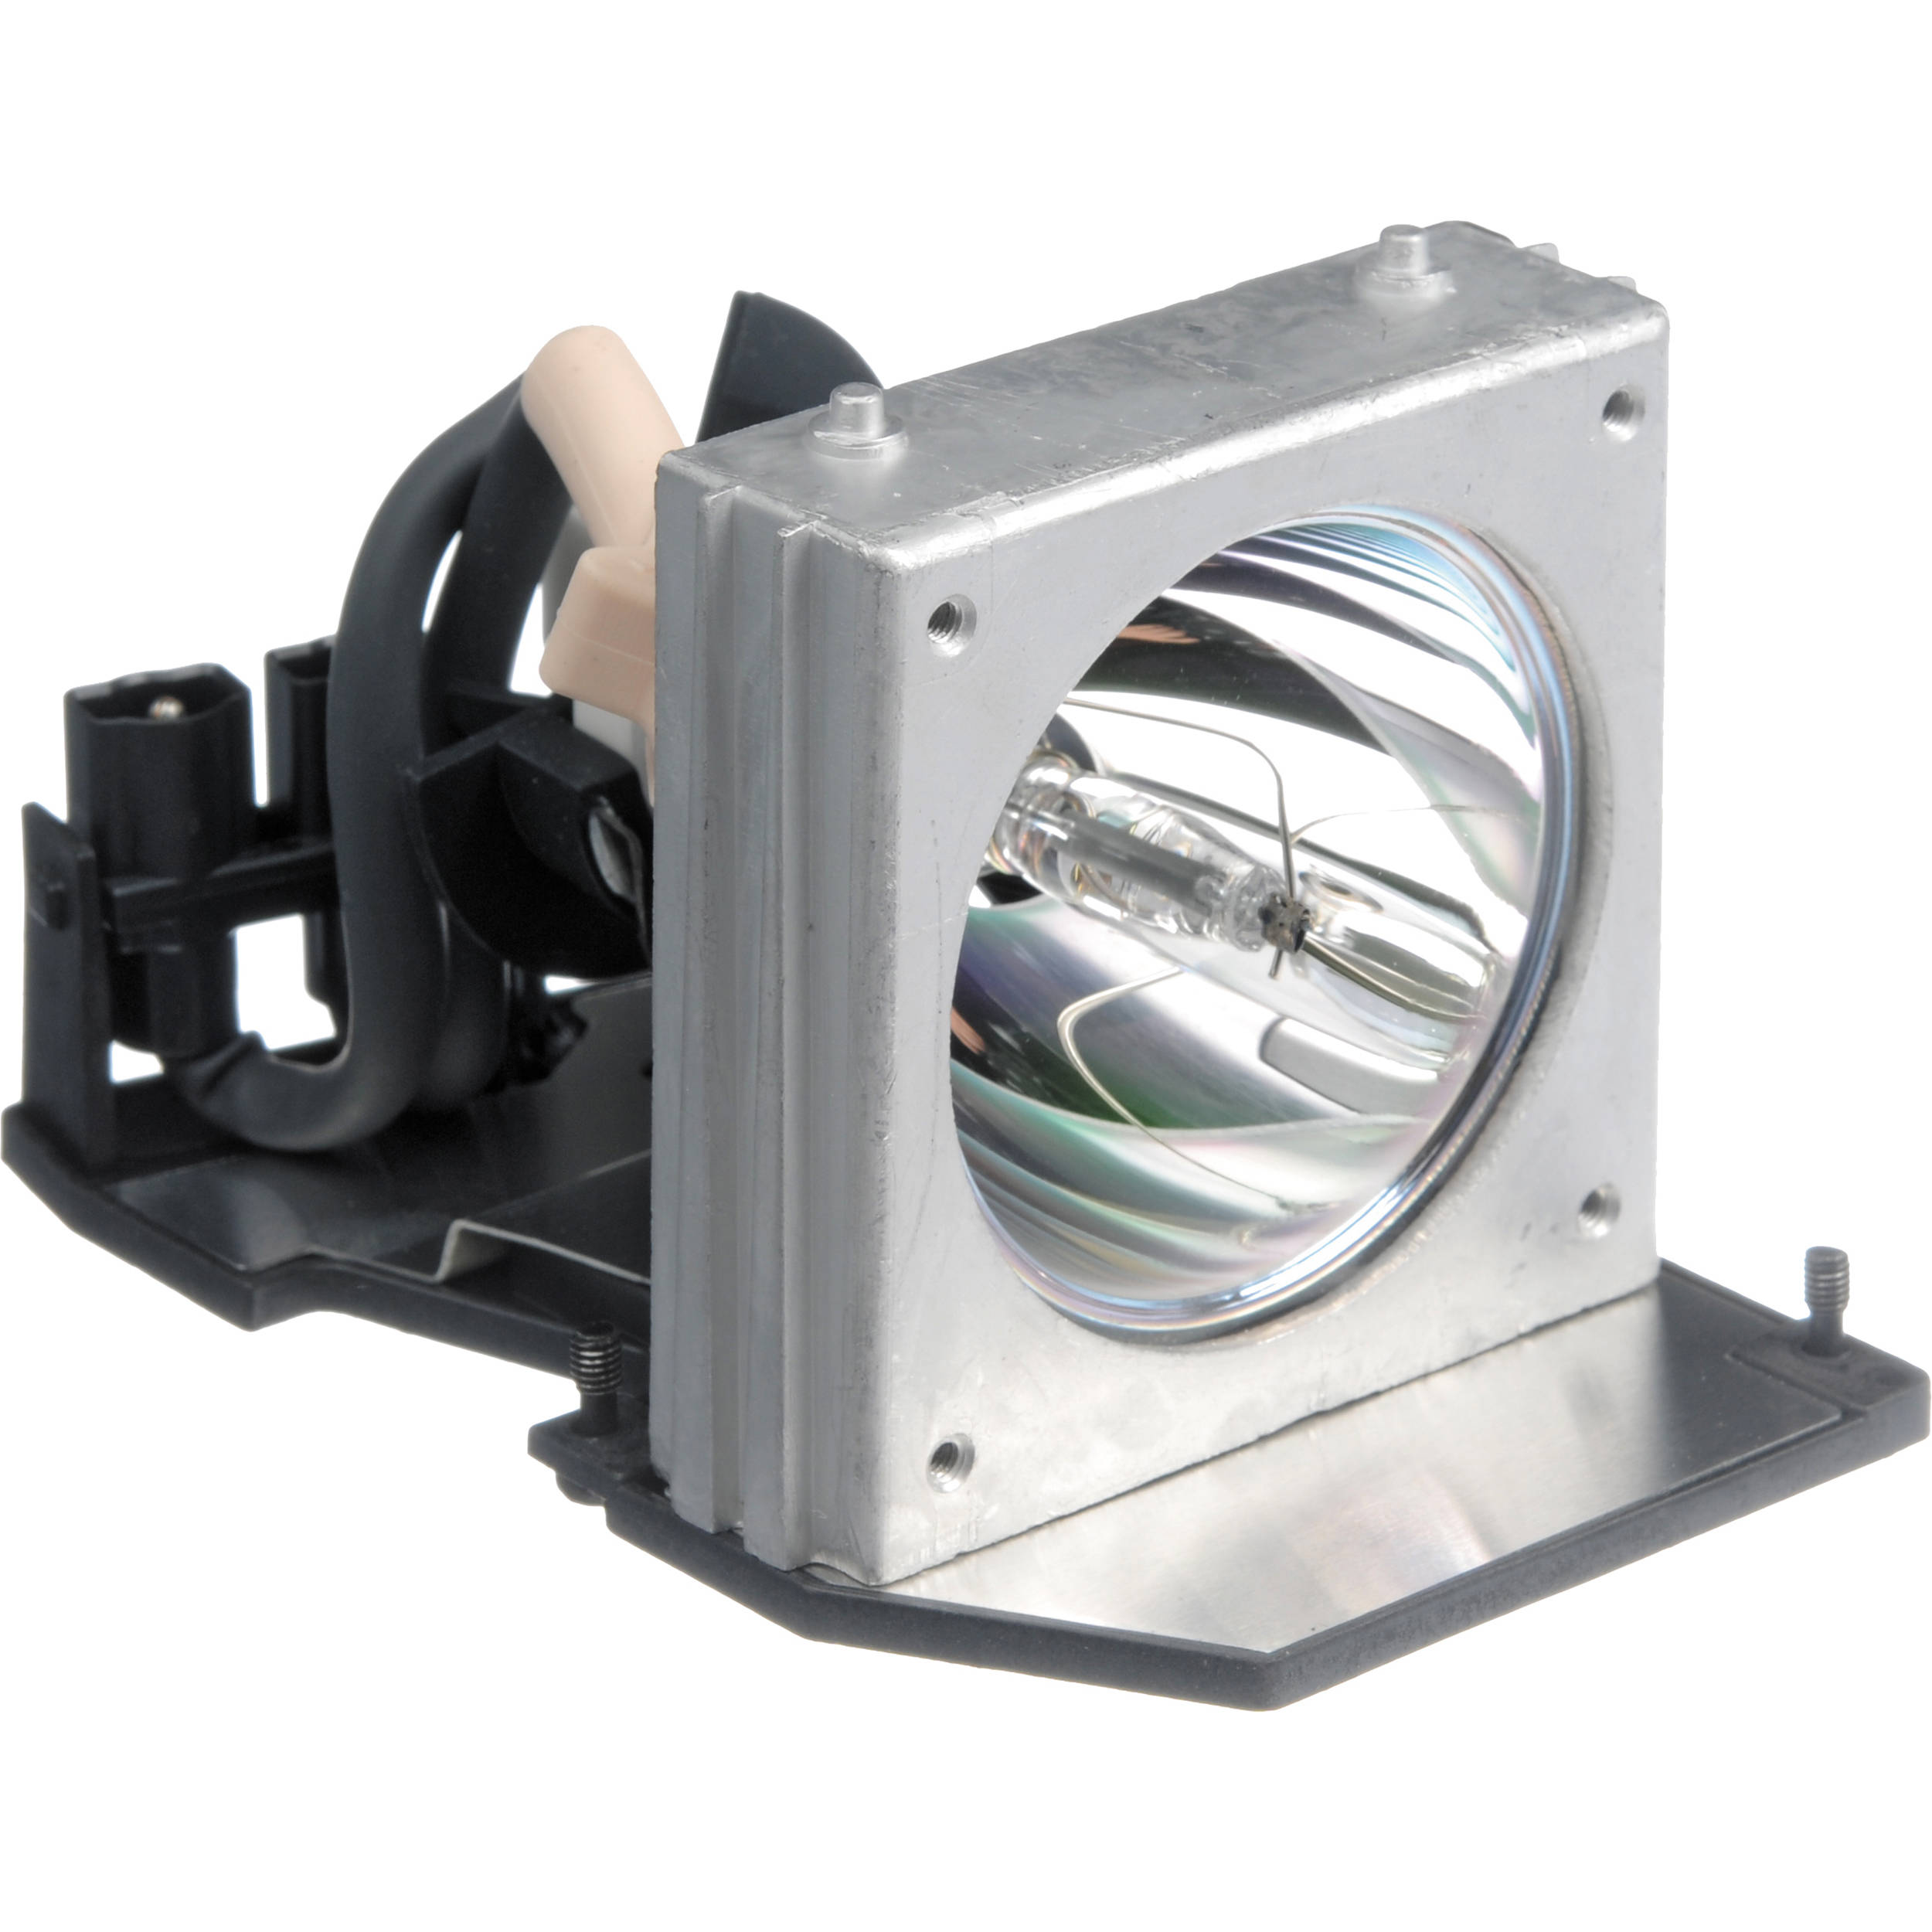 Optoma Technology BLFP200C Projector Lamp BL-FP200C B&H Photo